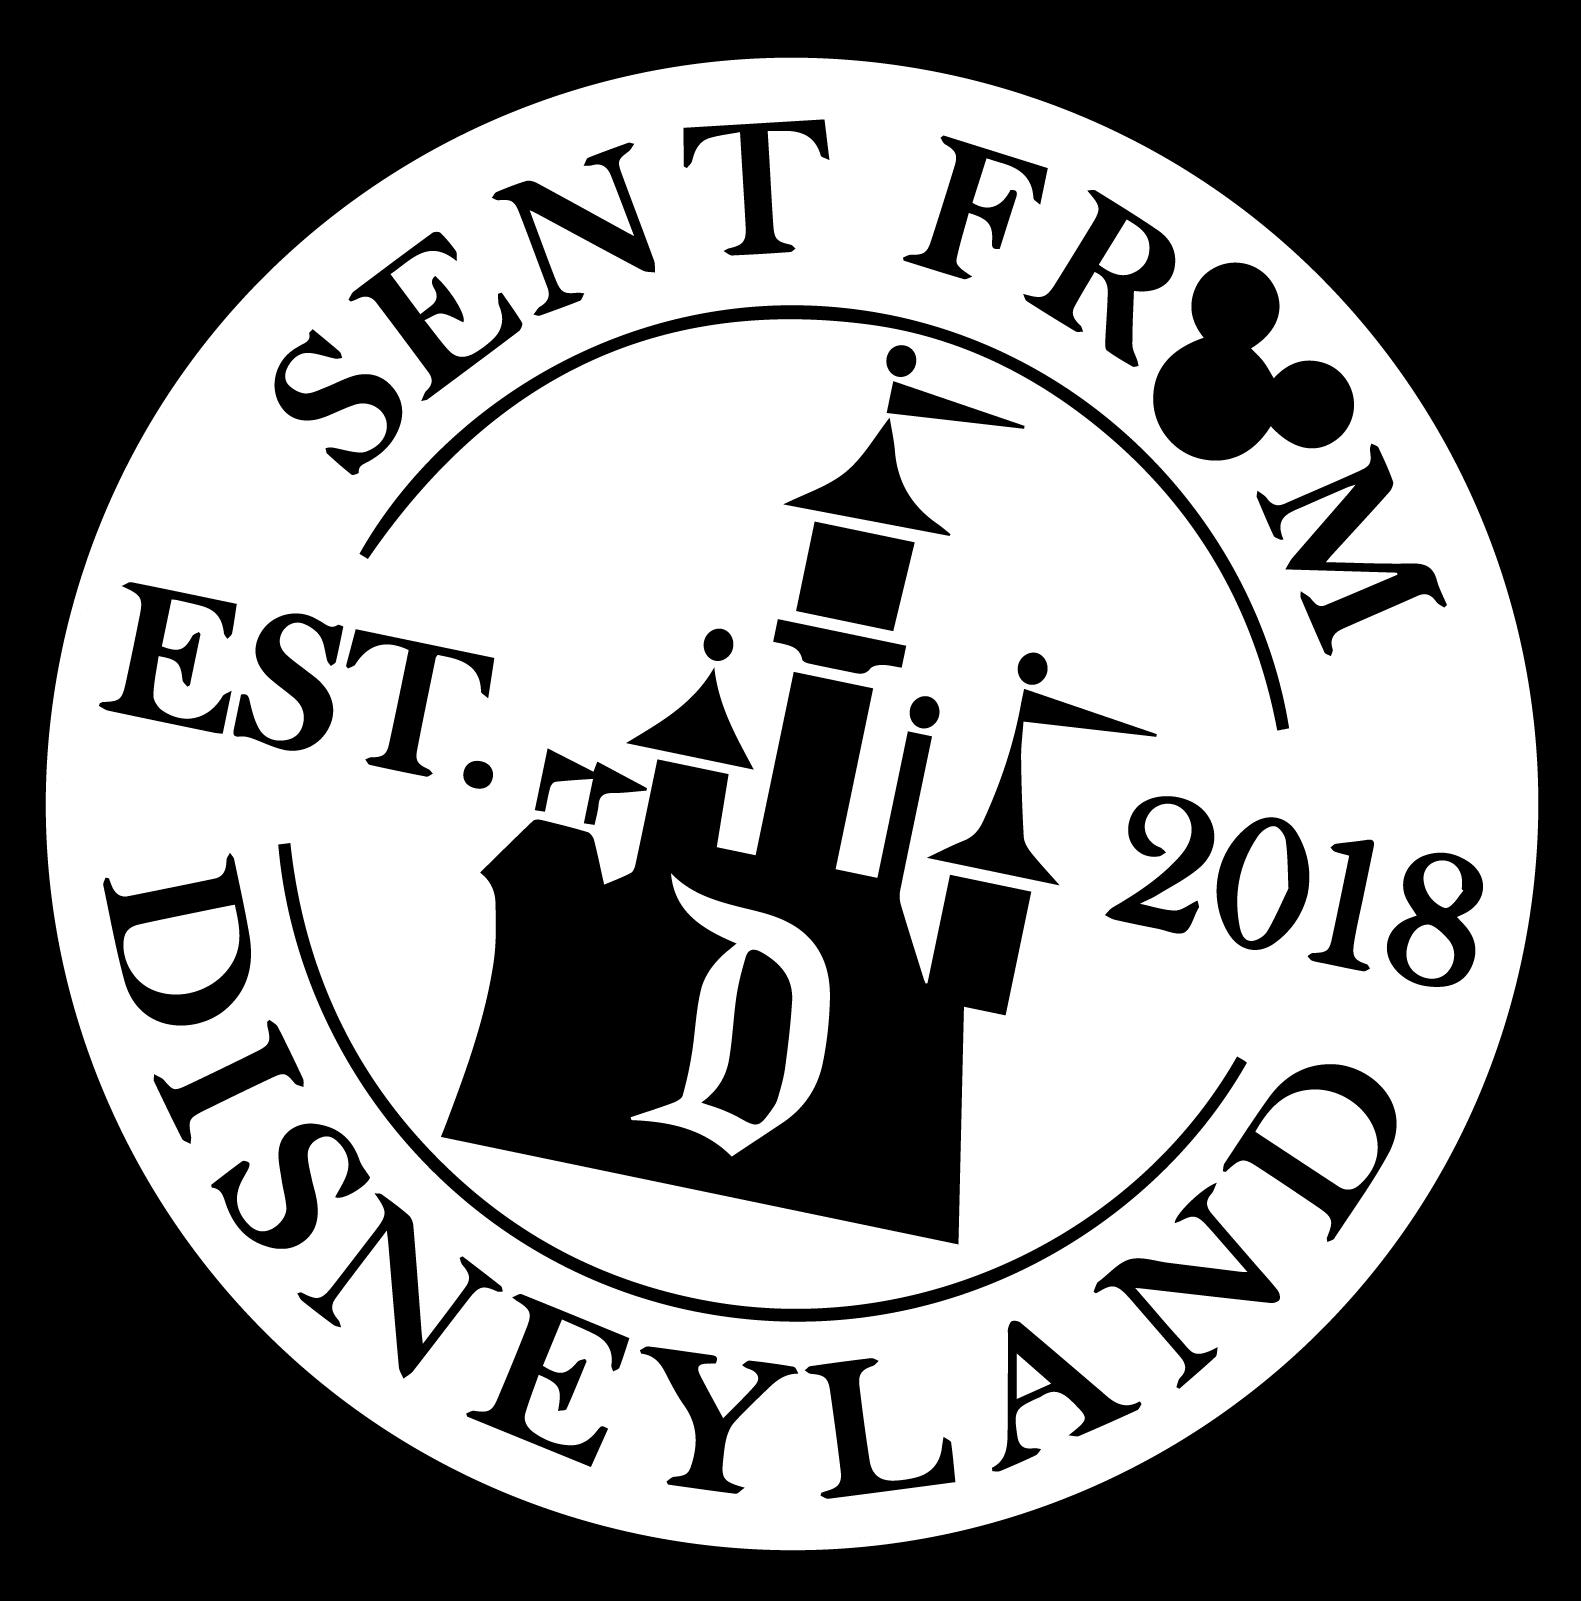 Sent From Disneyland logo